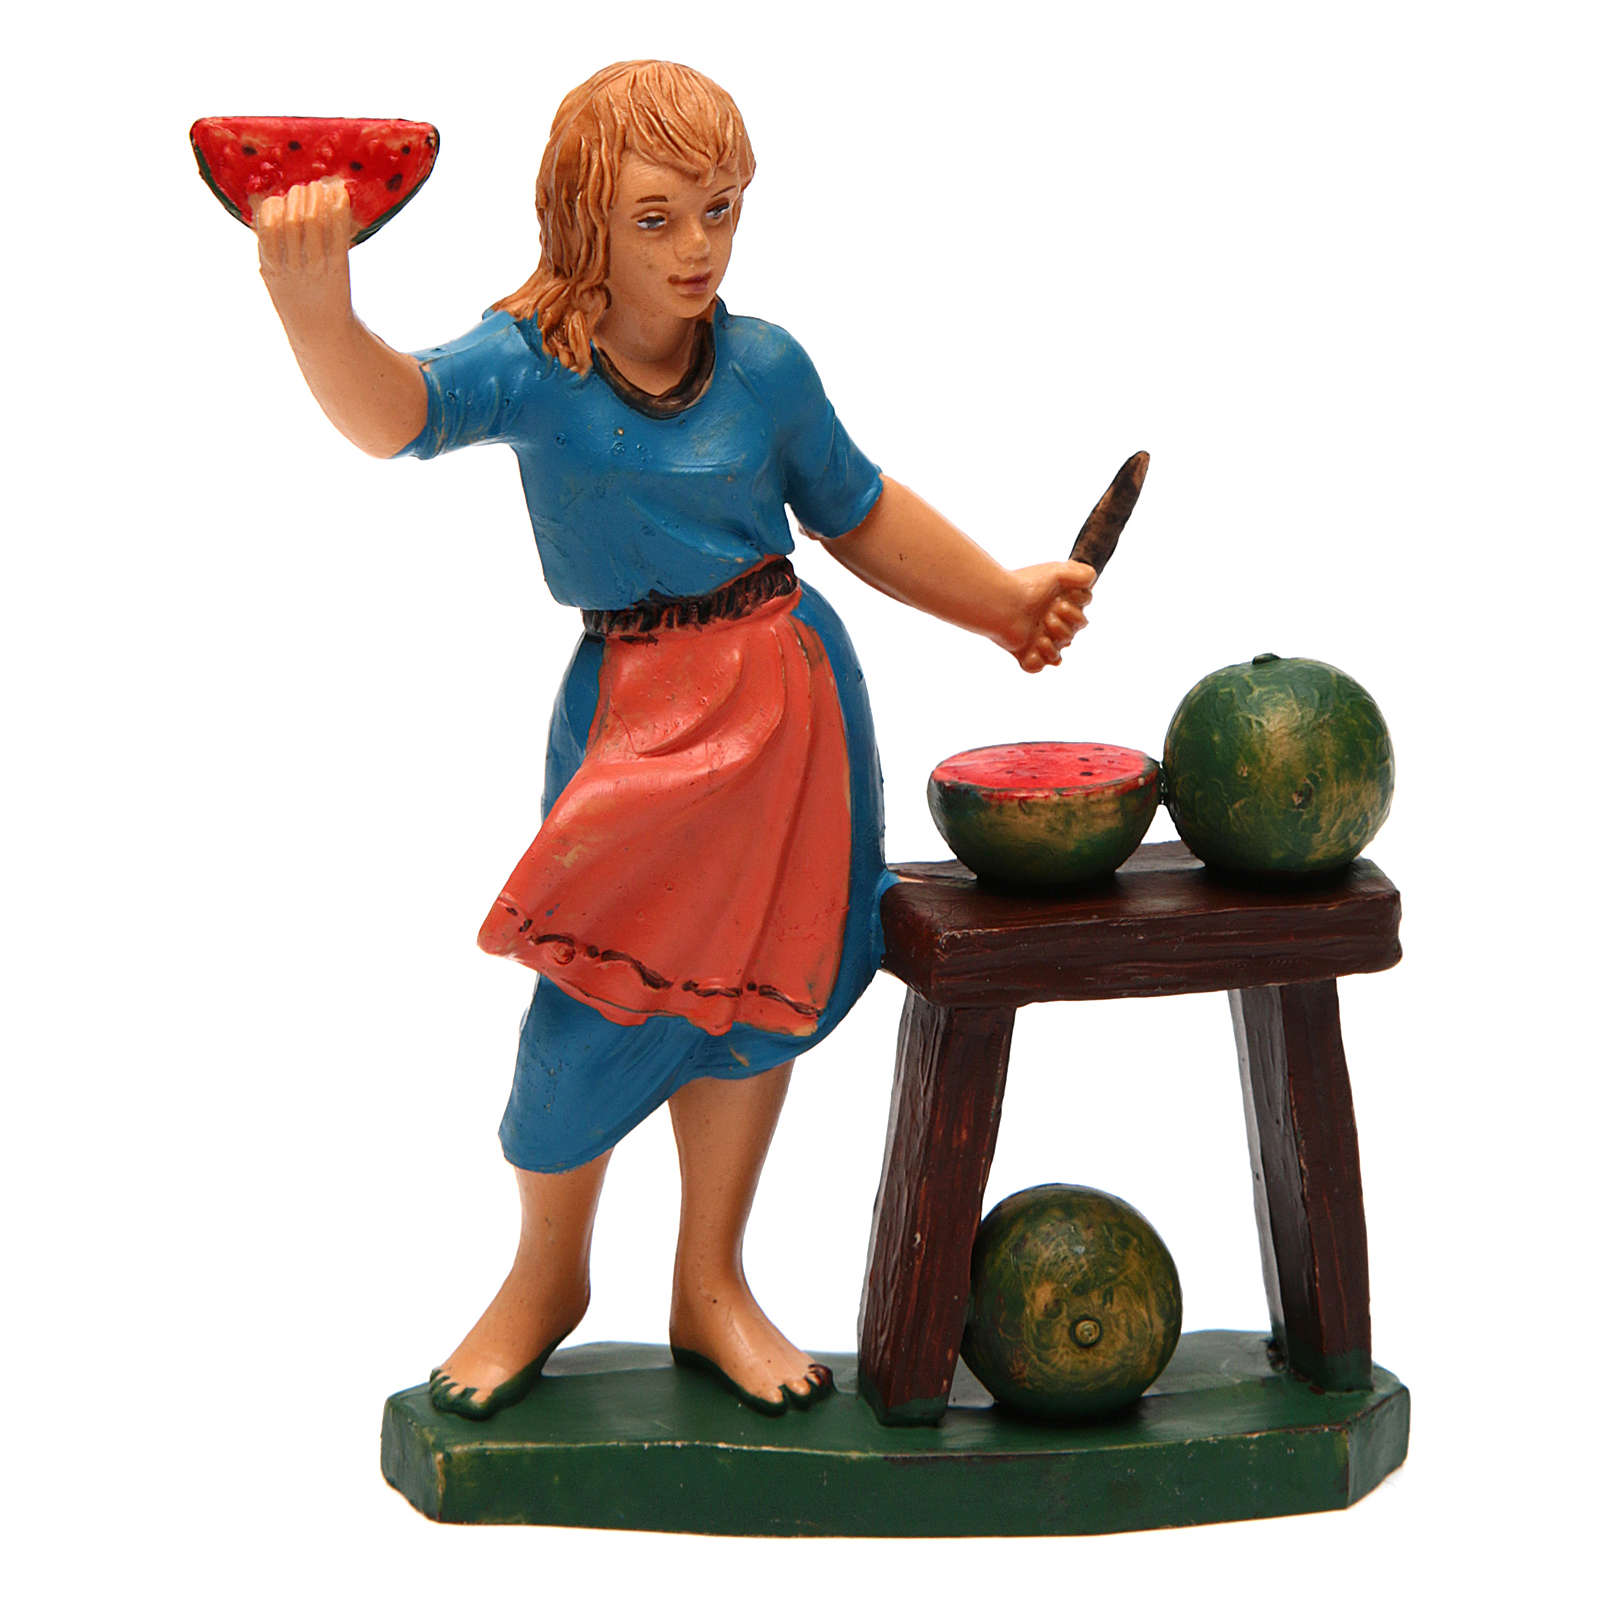 Mujer con mostrador de fruta ideal para belén de 12 cm de altura media 3